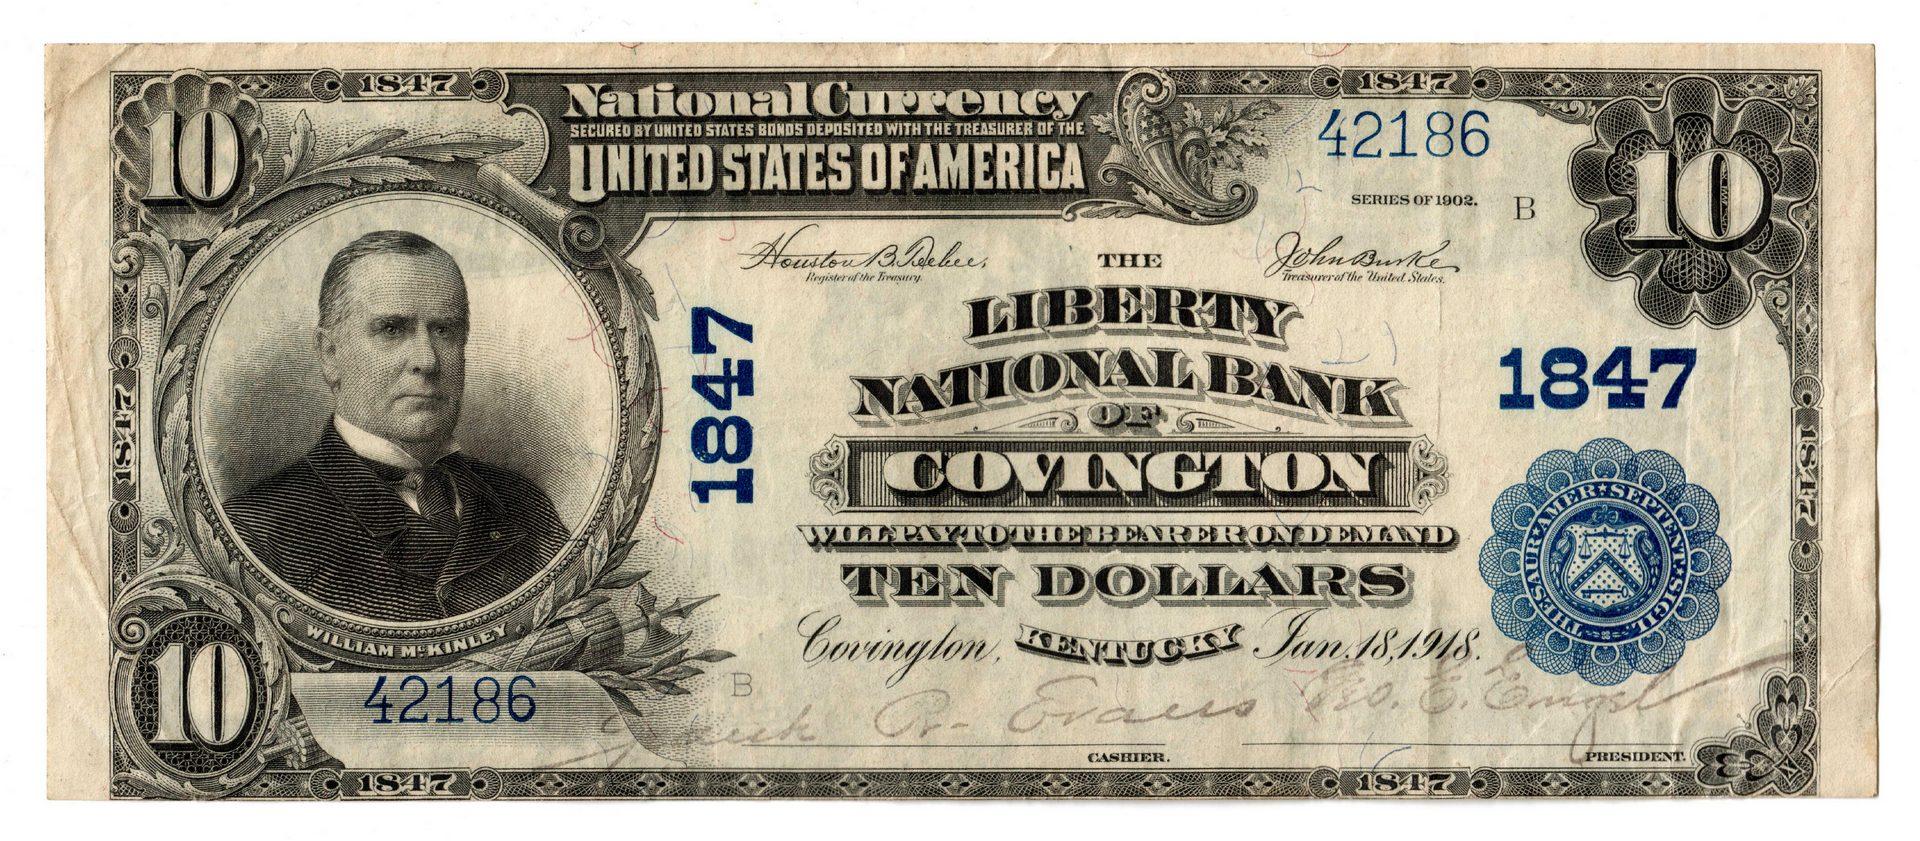 Lot 71: 1902 $10 Liberty National Bank of Covington Nation